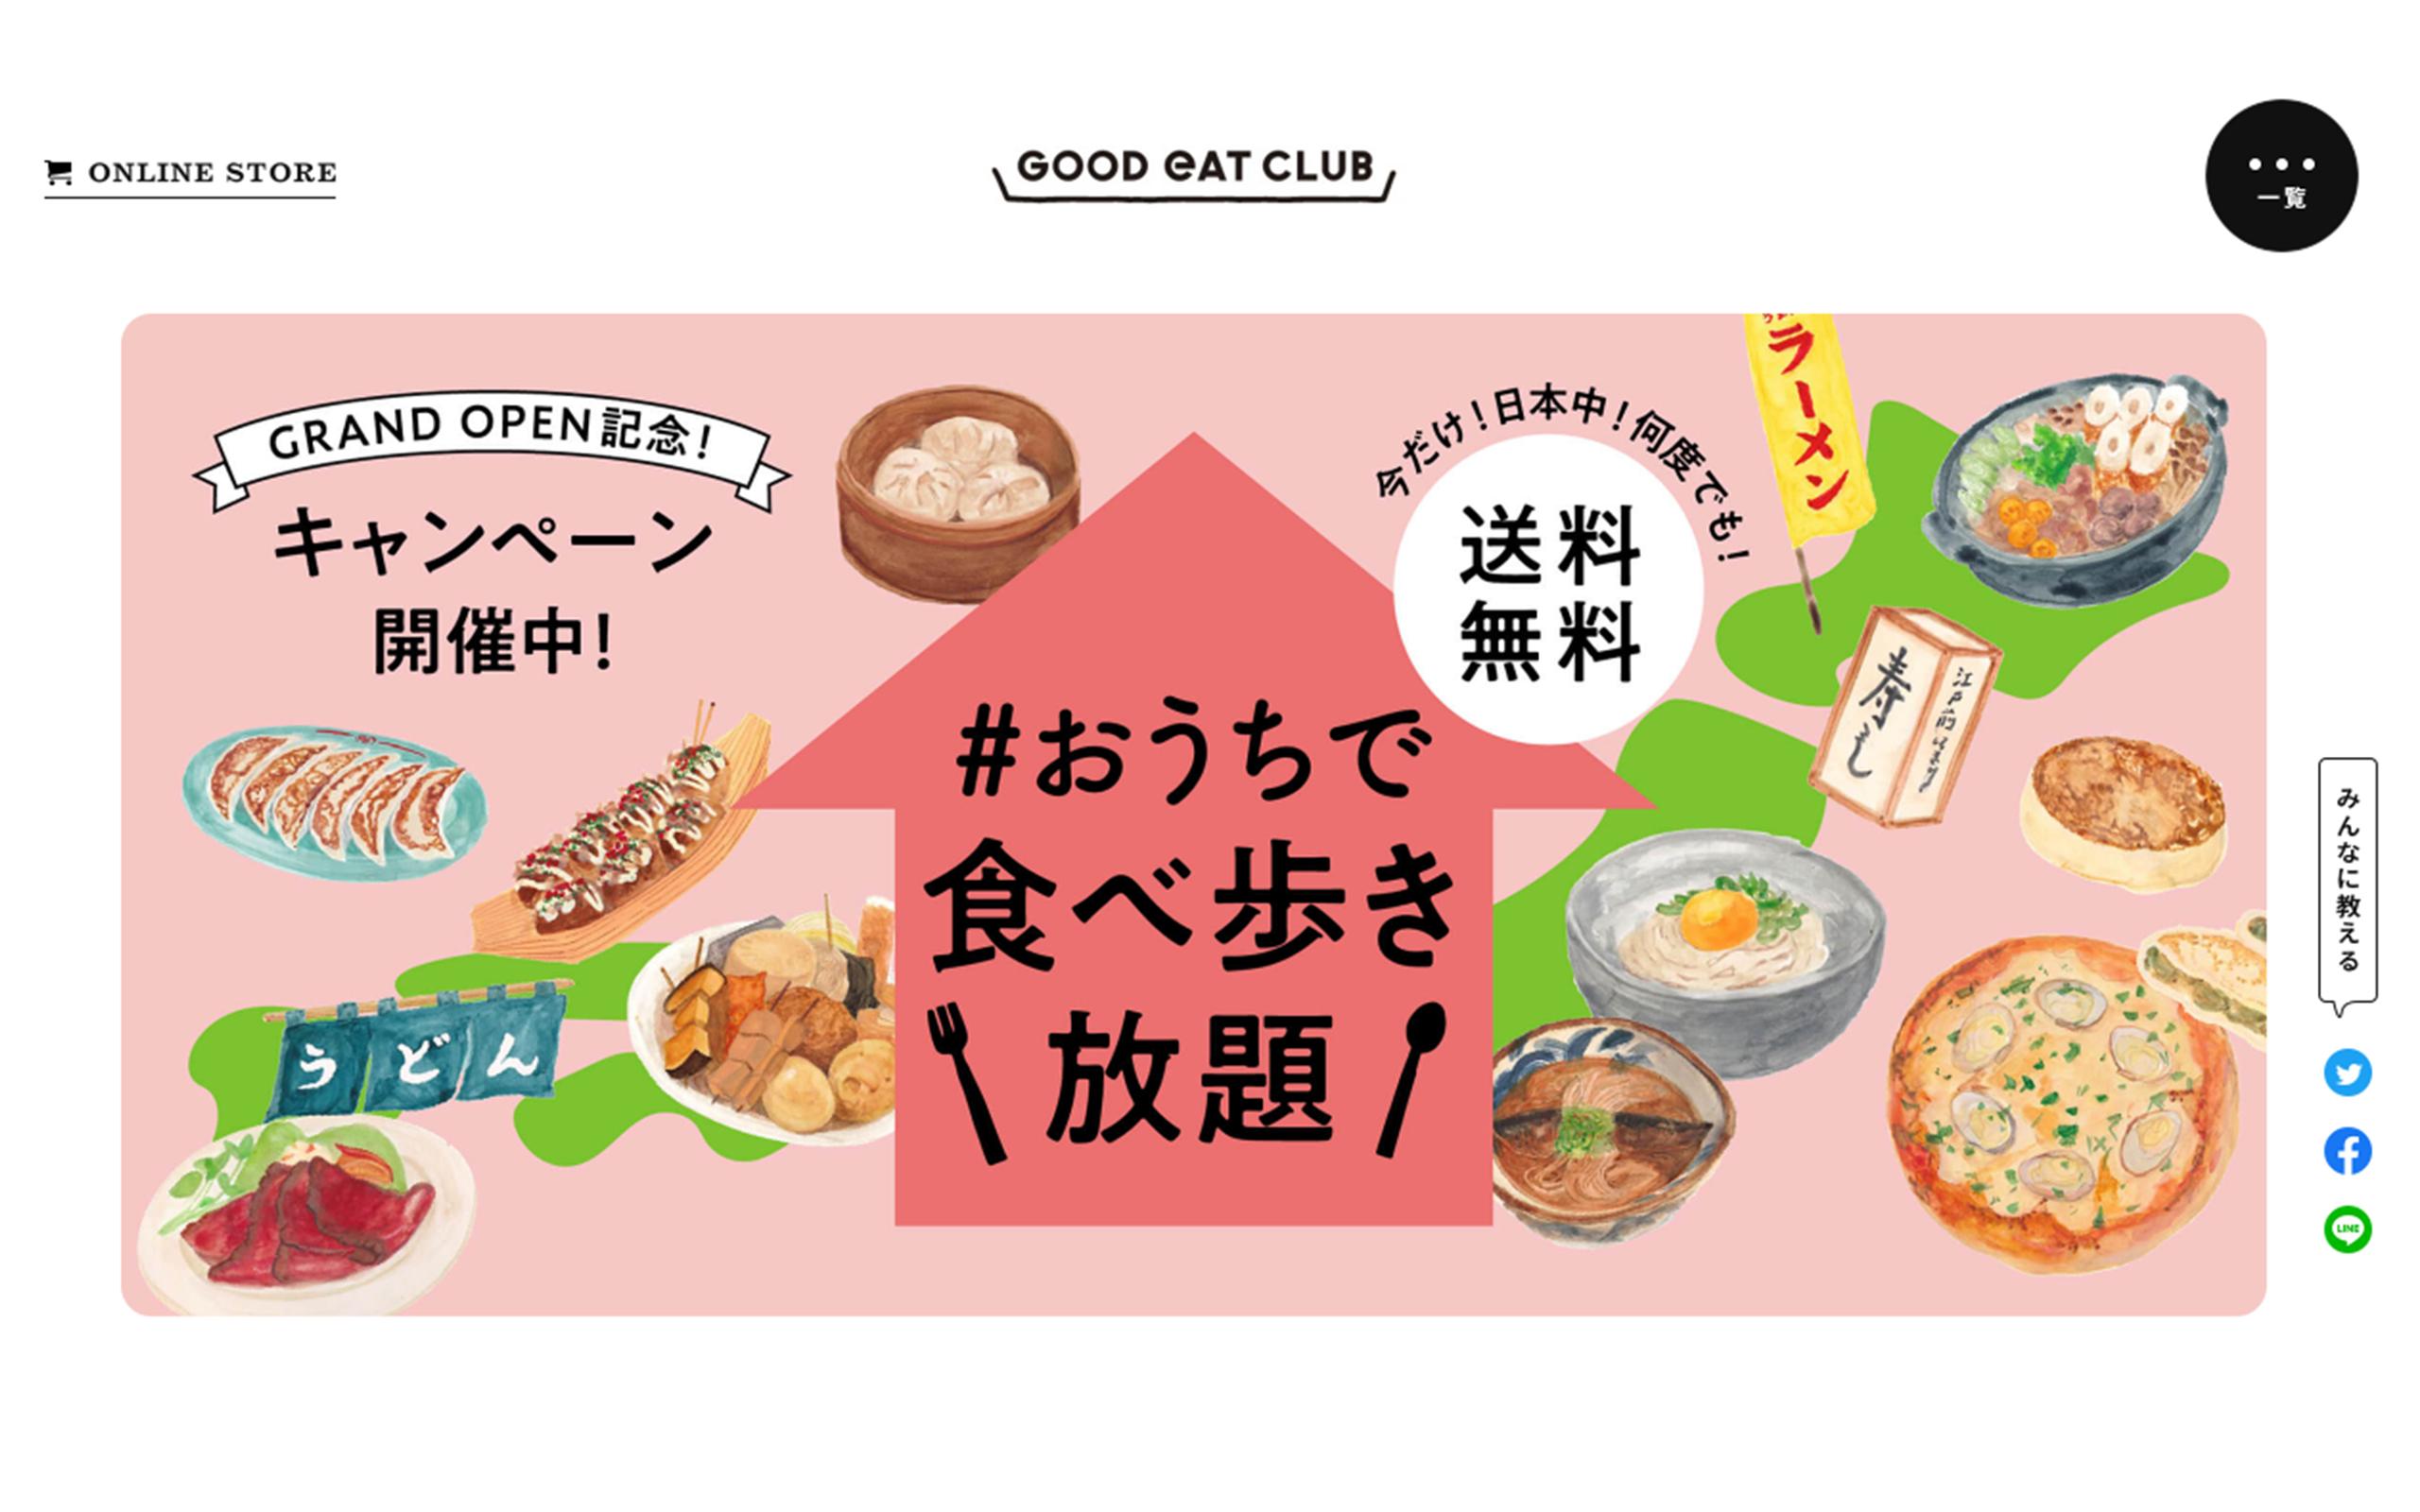 GOOD EAT CLUB <br>「#おうちで食べ歩き放題 キャンペーン」